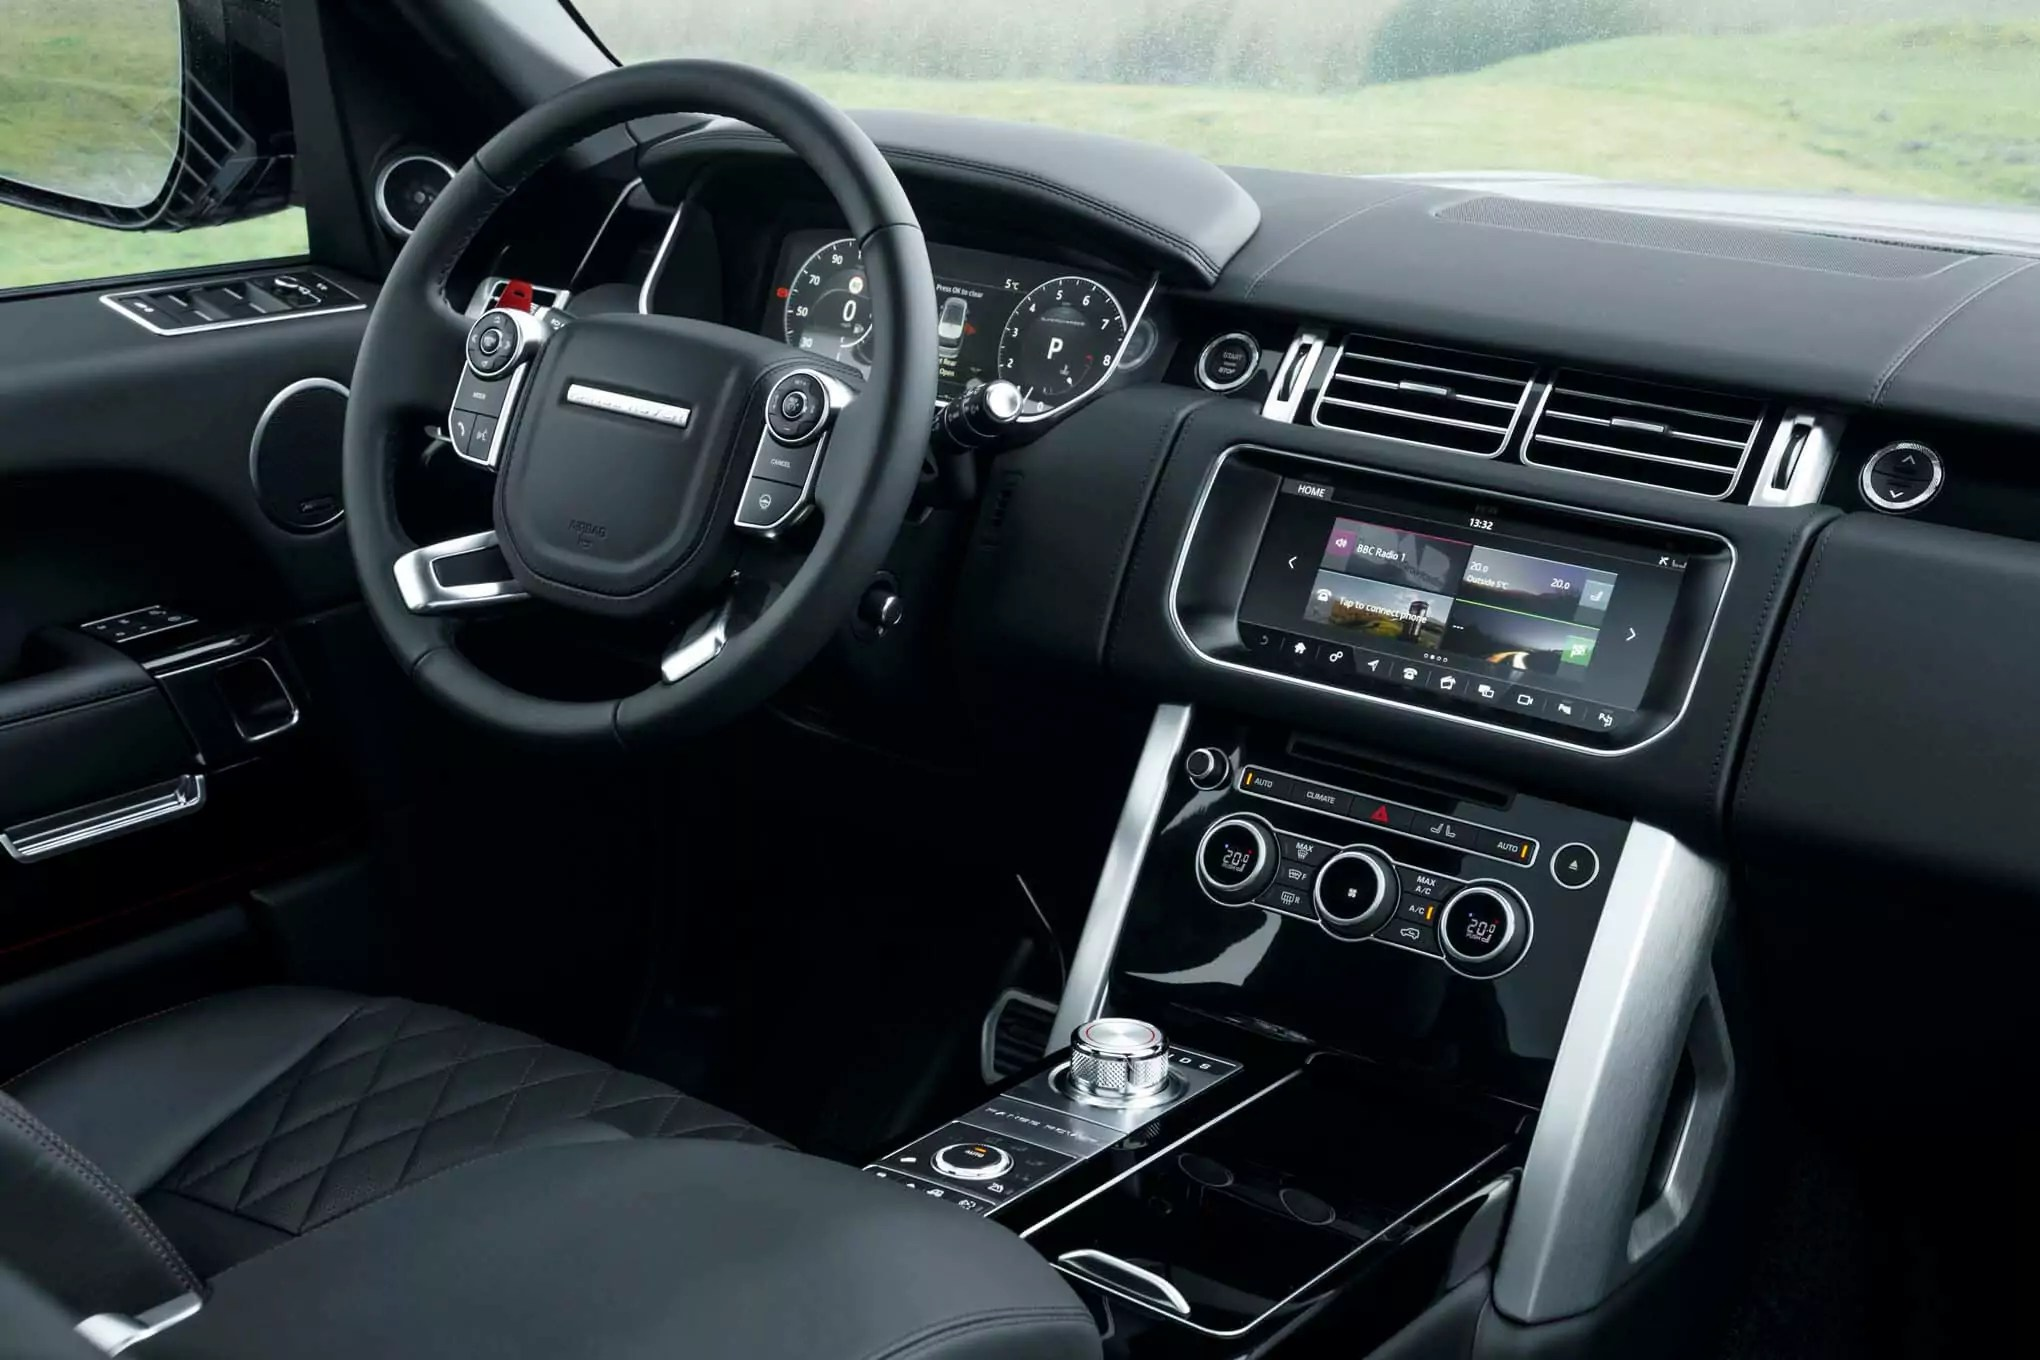 Range Rover SVAutobiography takes on Bentley Bentayga Battle for